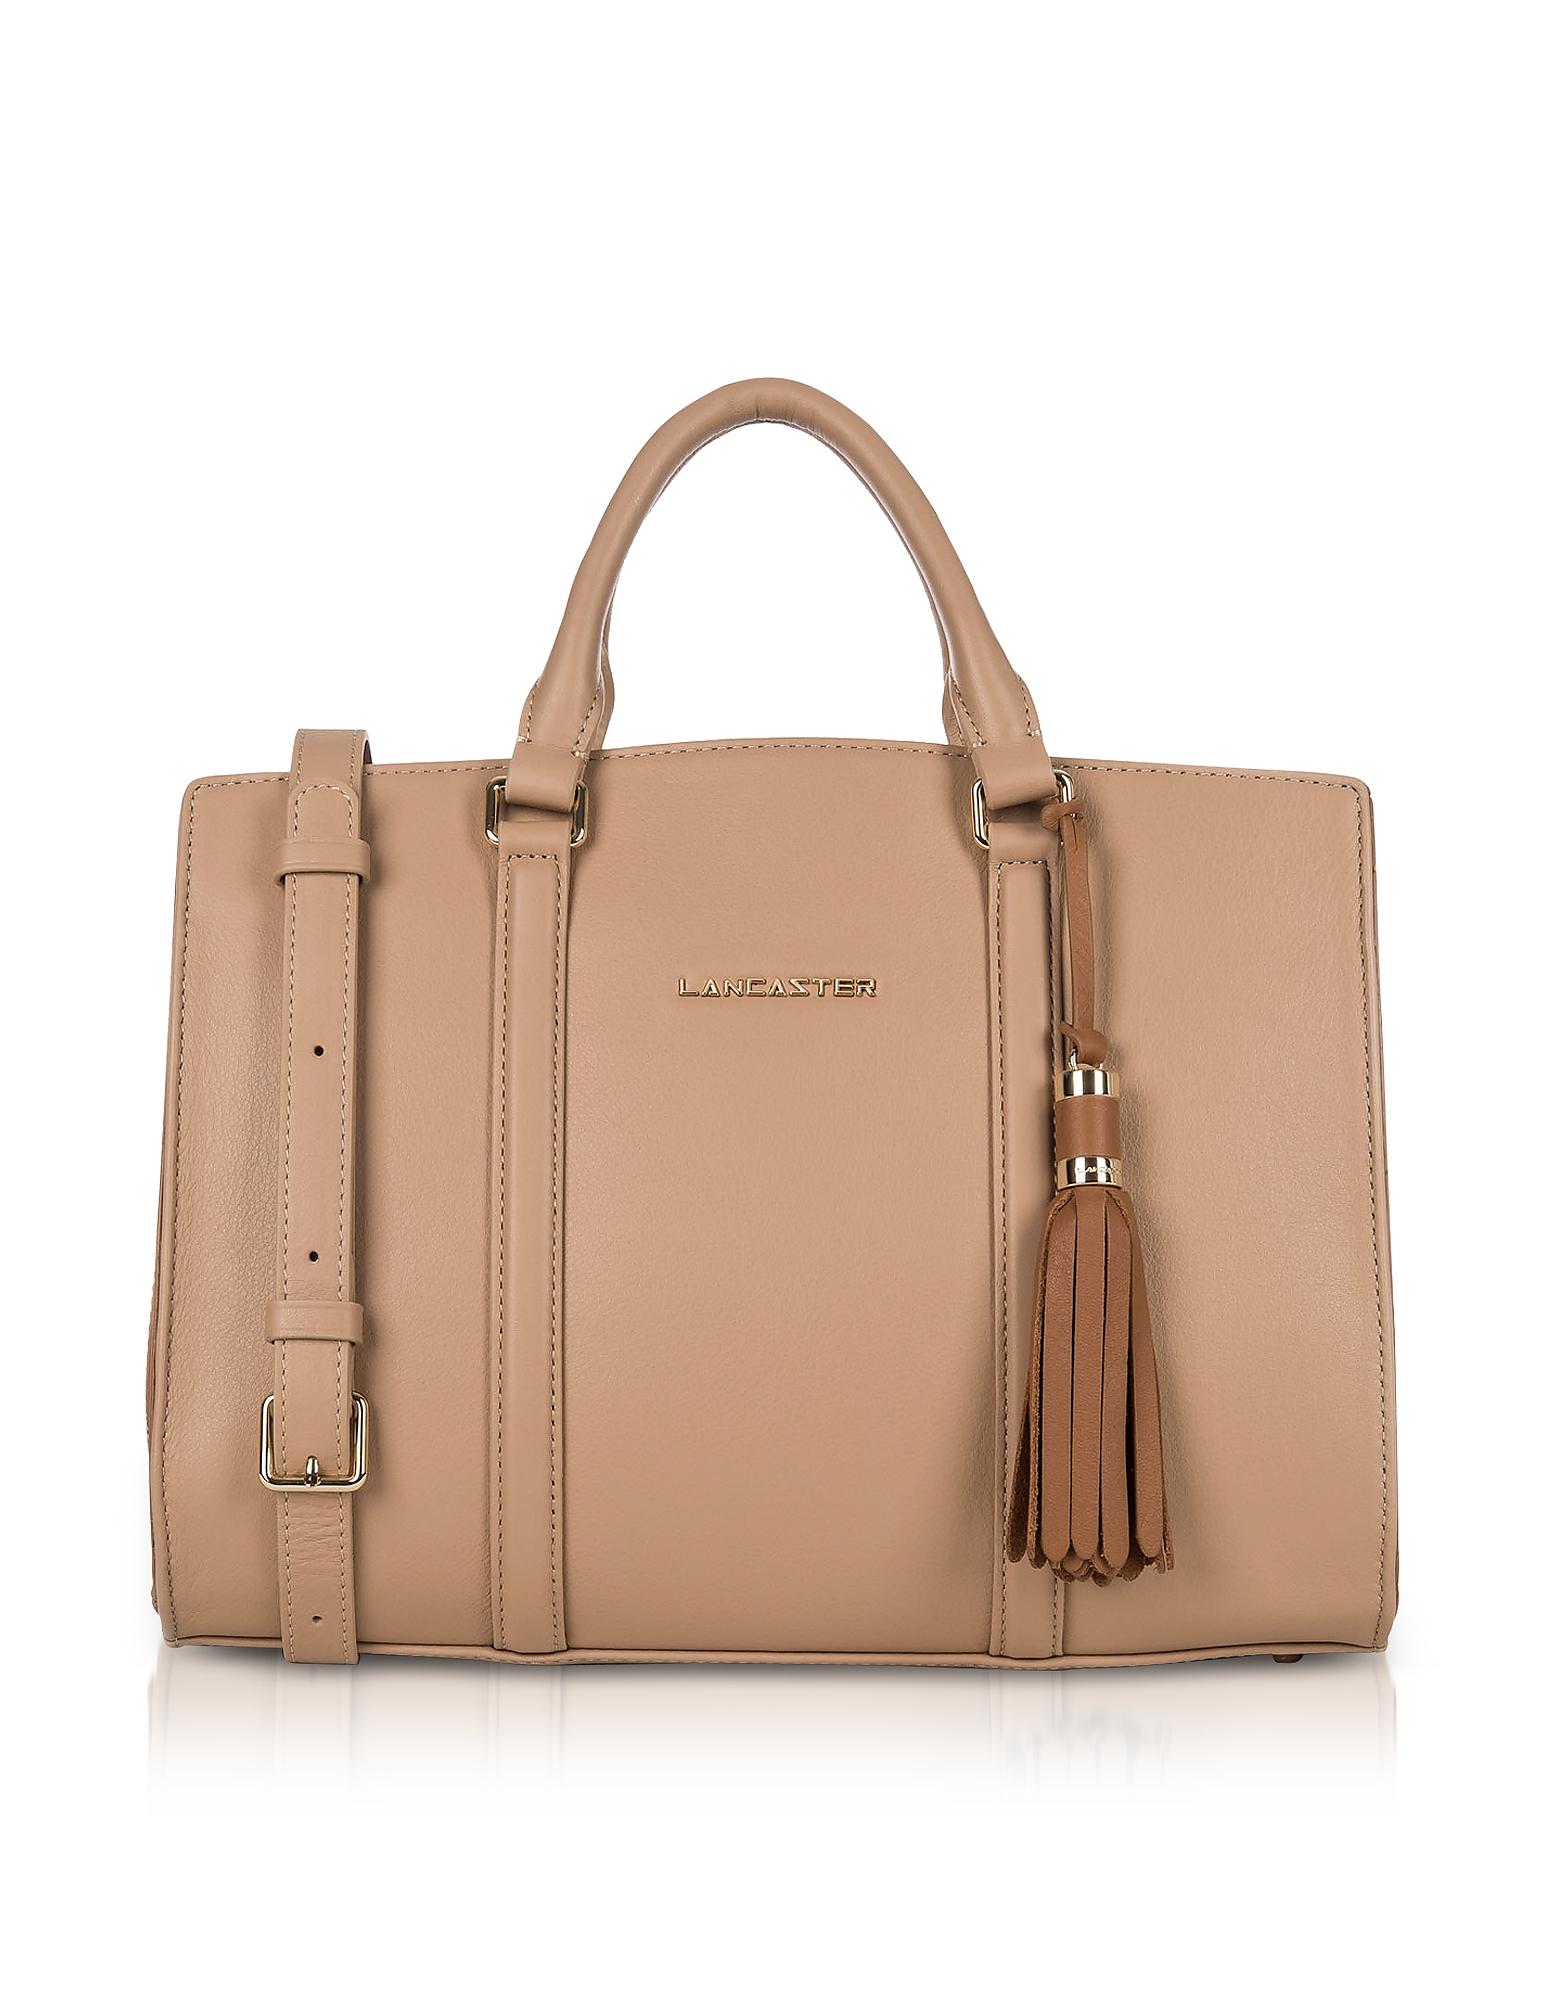 Mademoiselle Ana Nude/Hazelnut Leather Large Satchel Bag